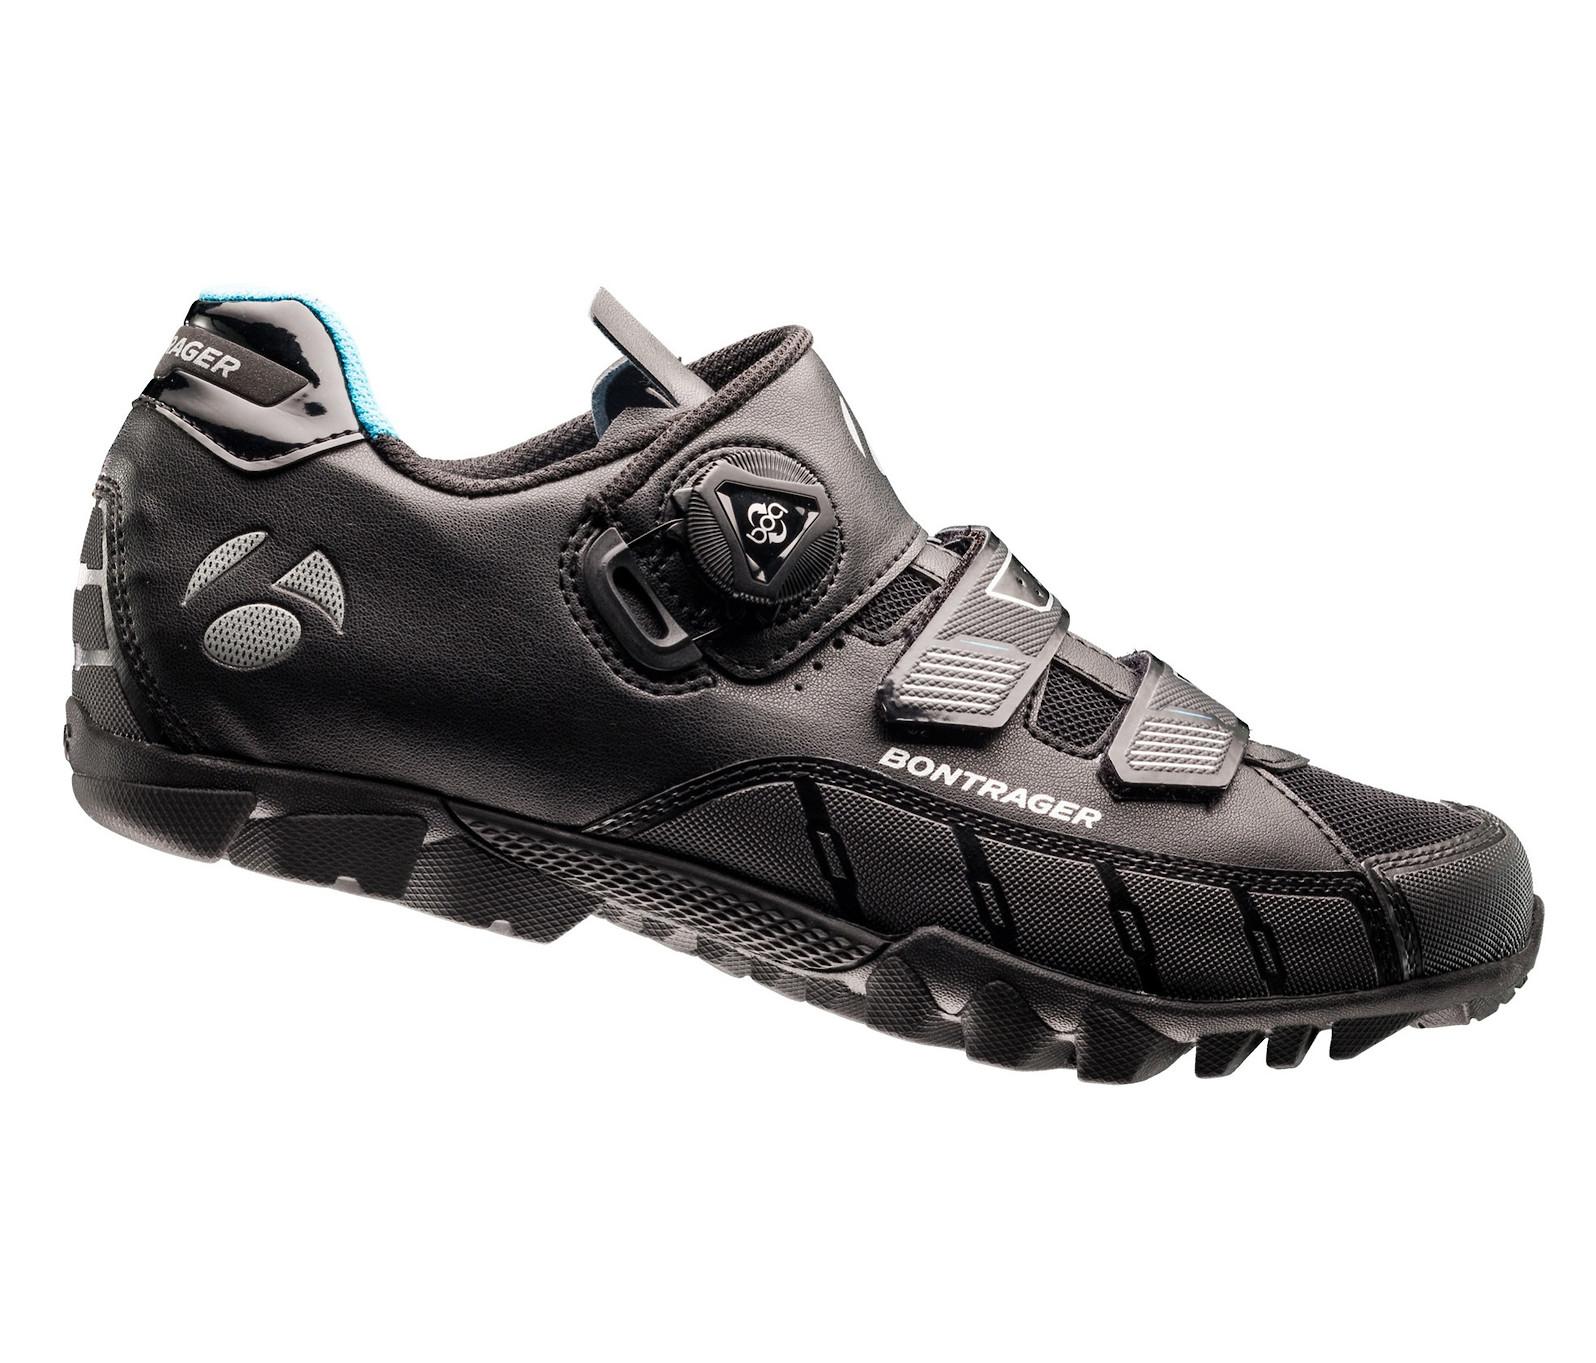 Bontrager Igneo Women's Mountain Shoe (Black)